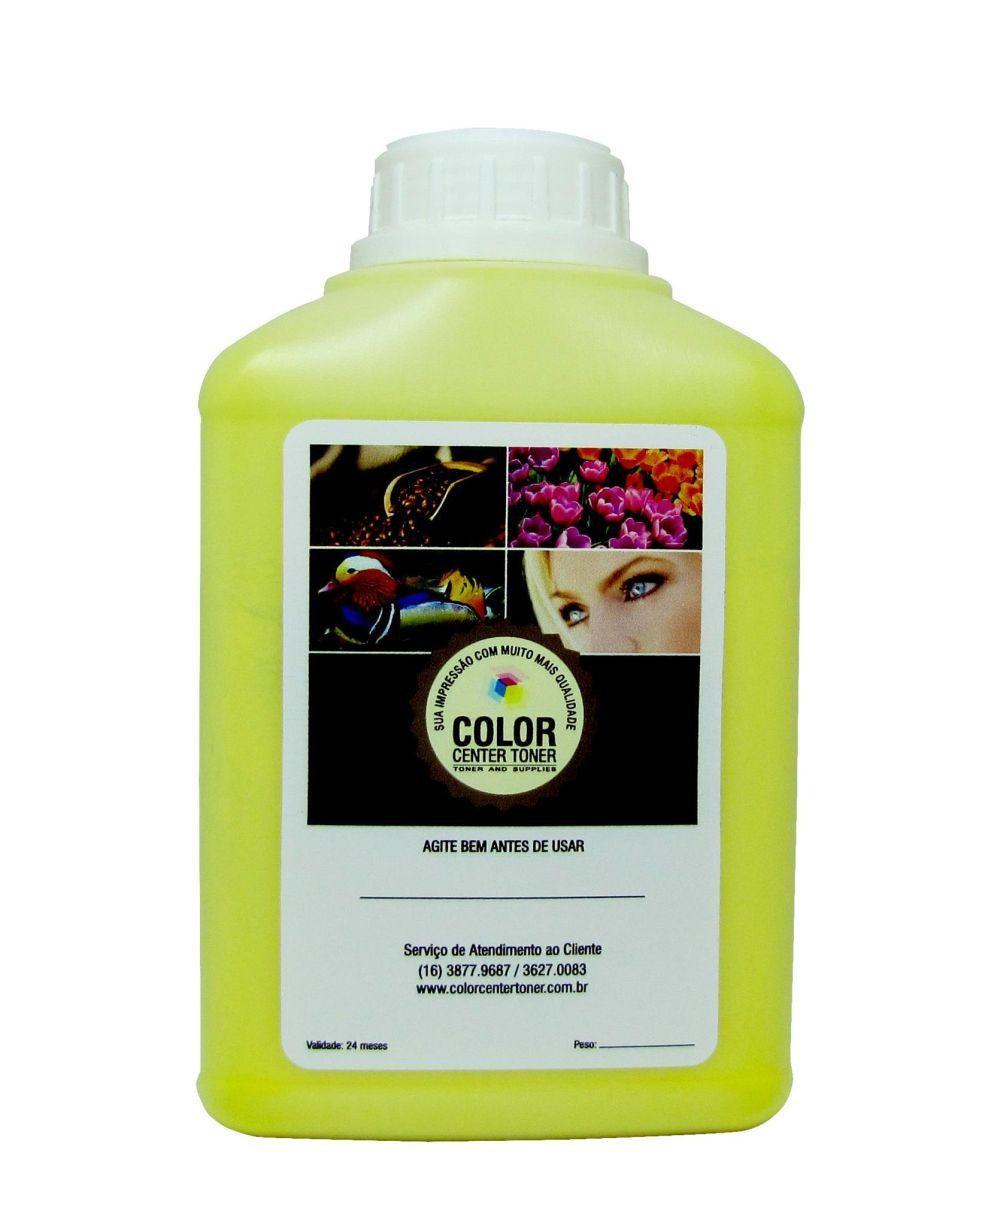 Refil de Toner Okidata C8600/8800 Amarelo